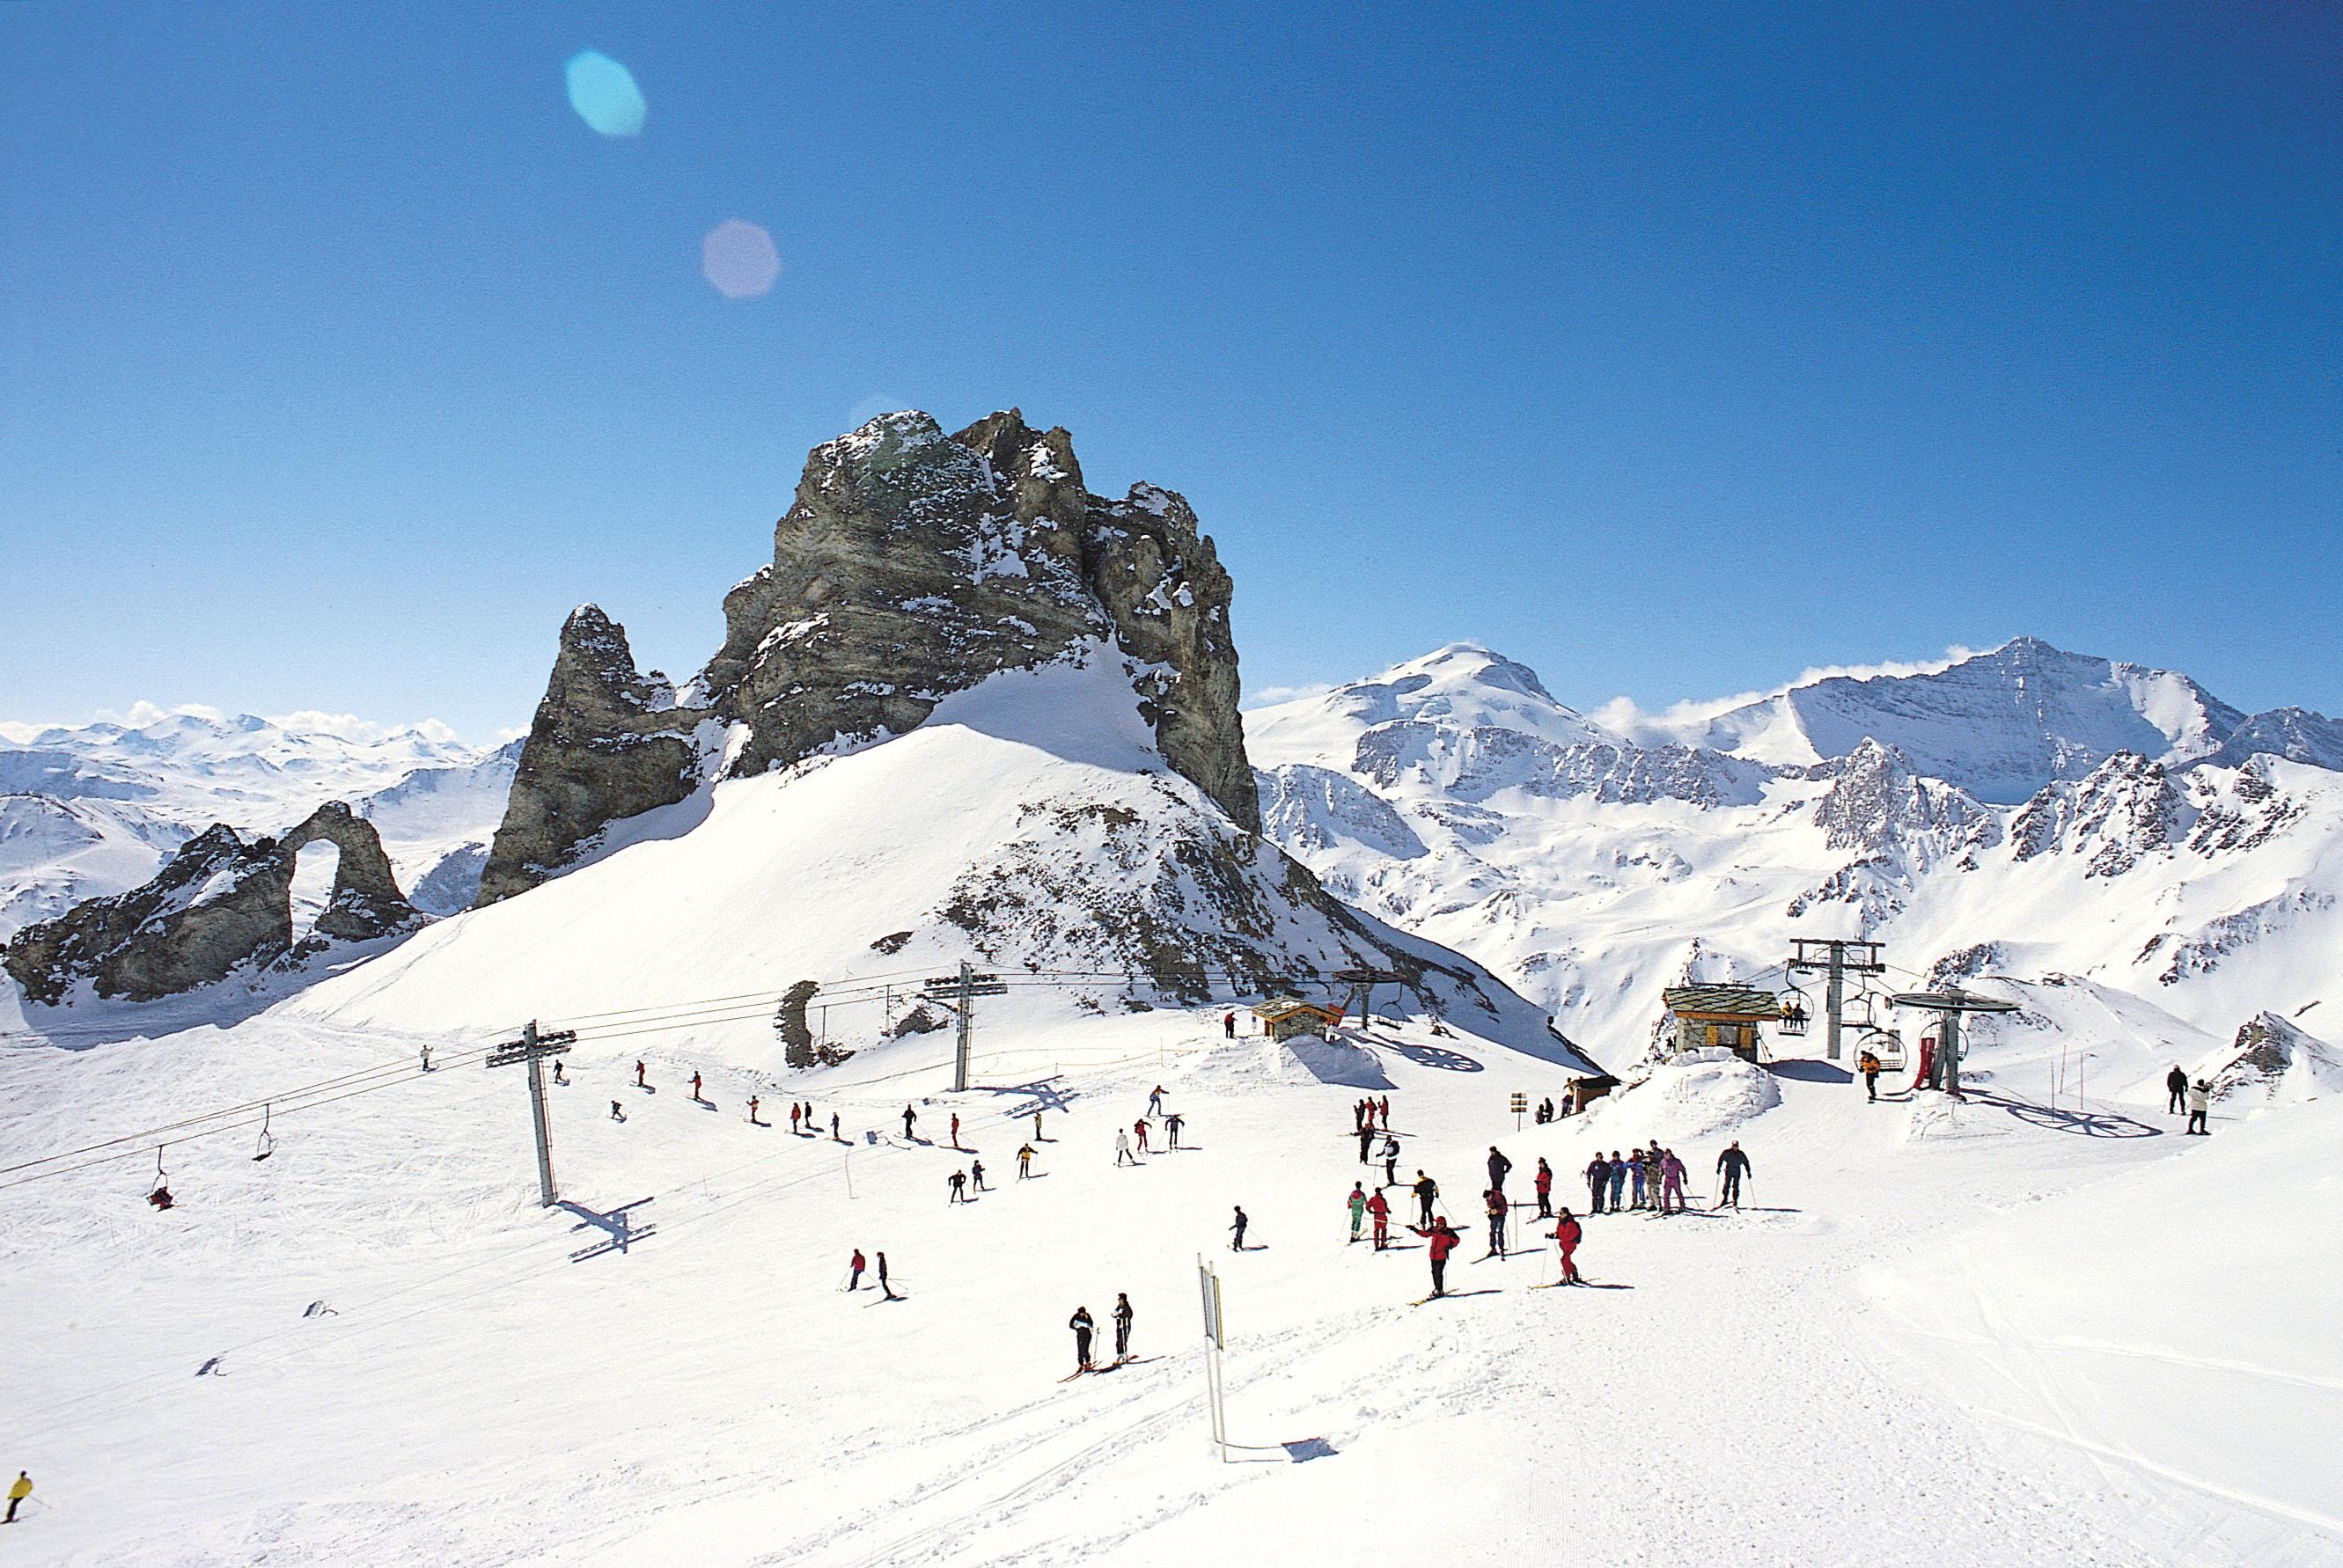 tignes snow report 14.01.2014 - ski total